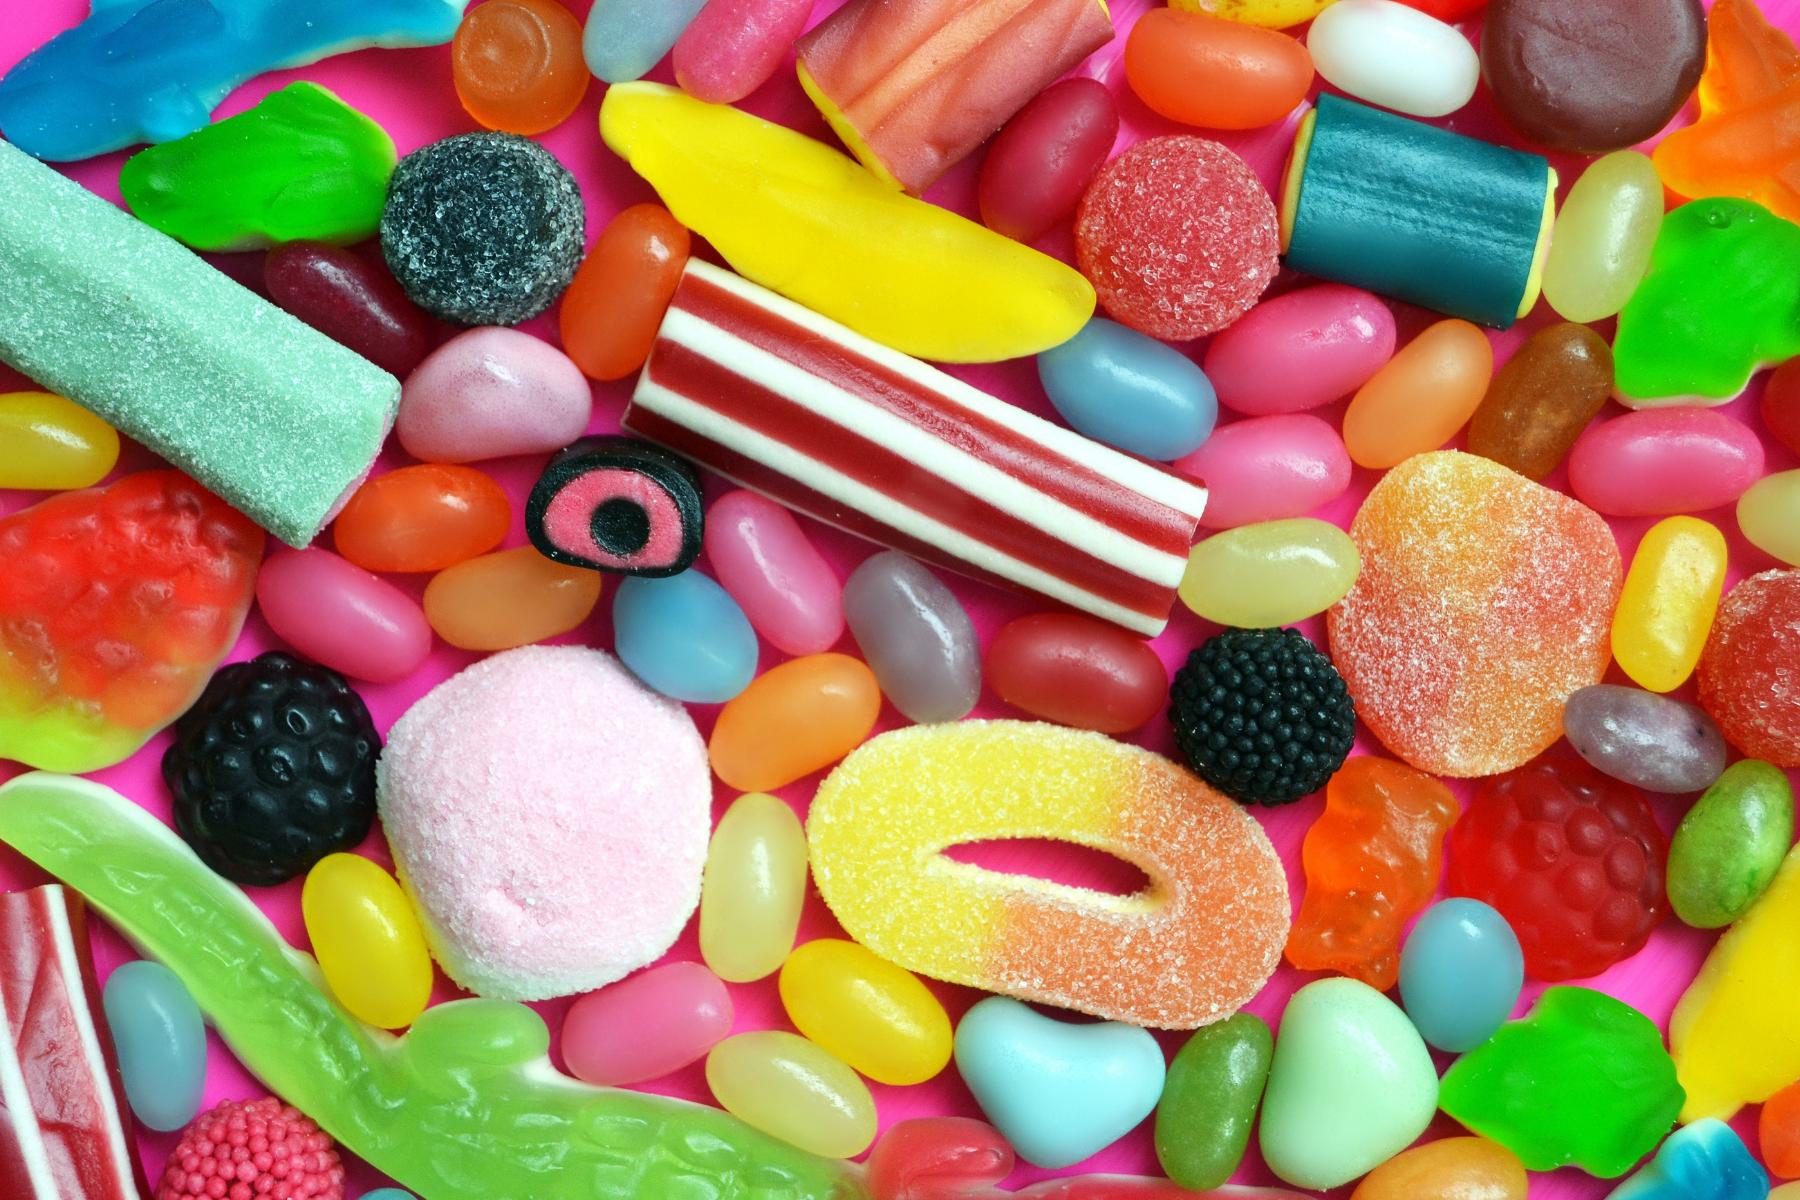 Common Foods that Damage Teeth